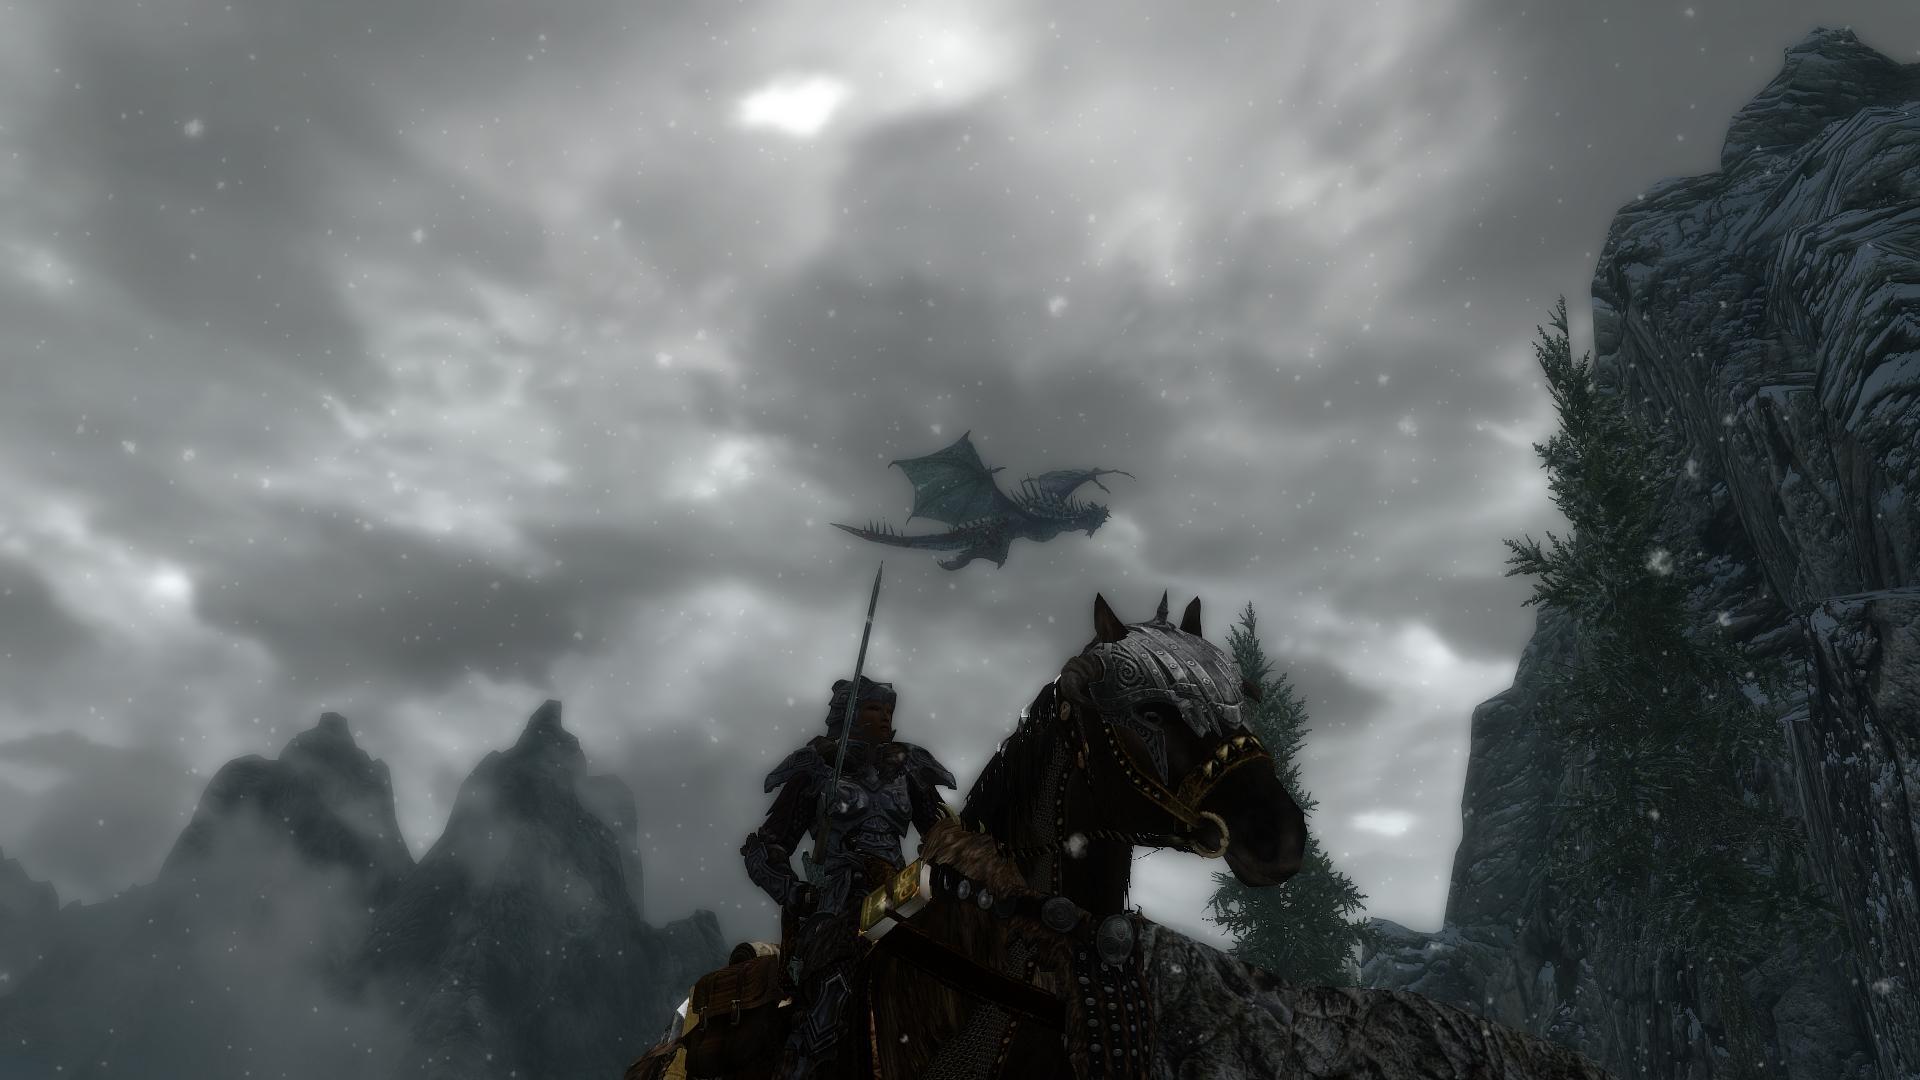 000222.Jpg - Elder Scrolls 5: Skyrim, the